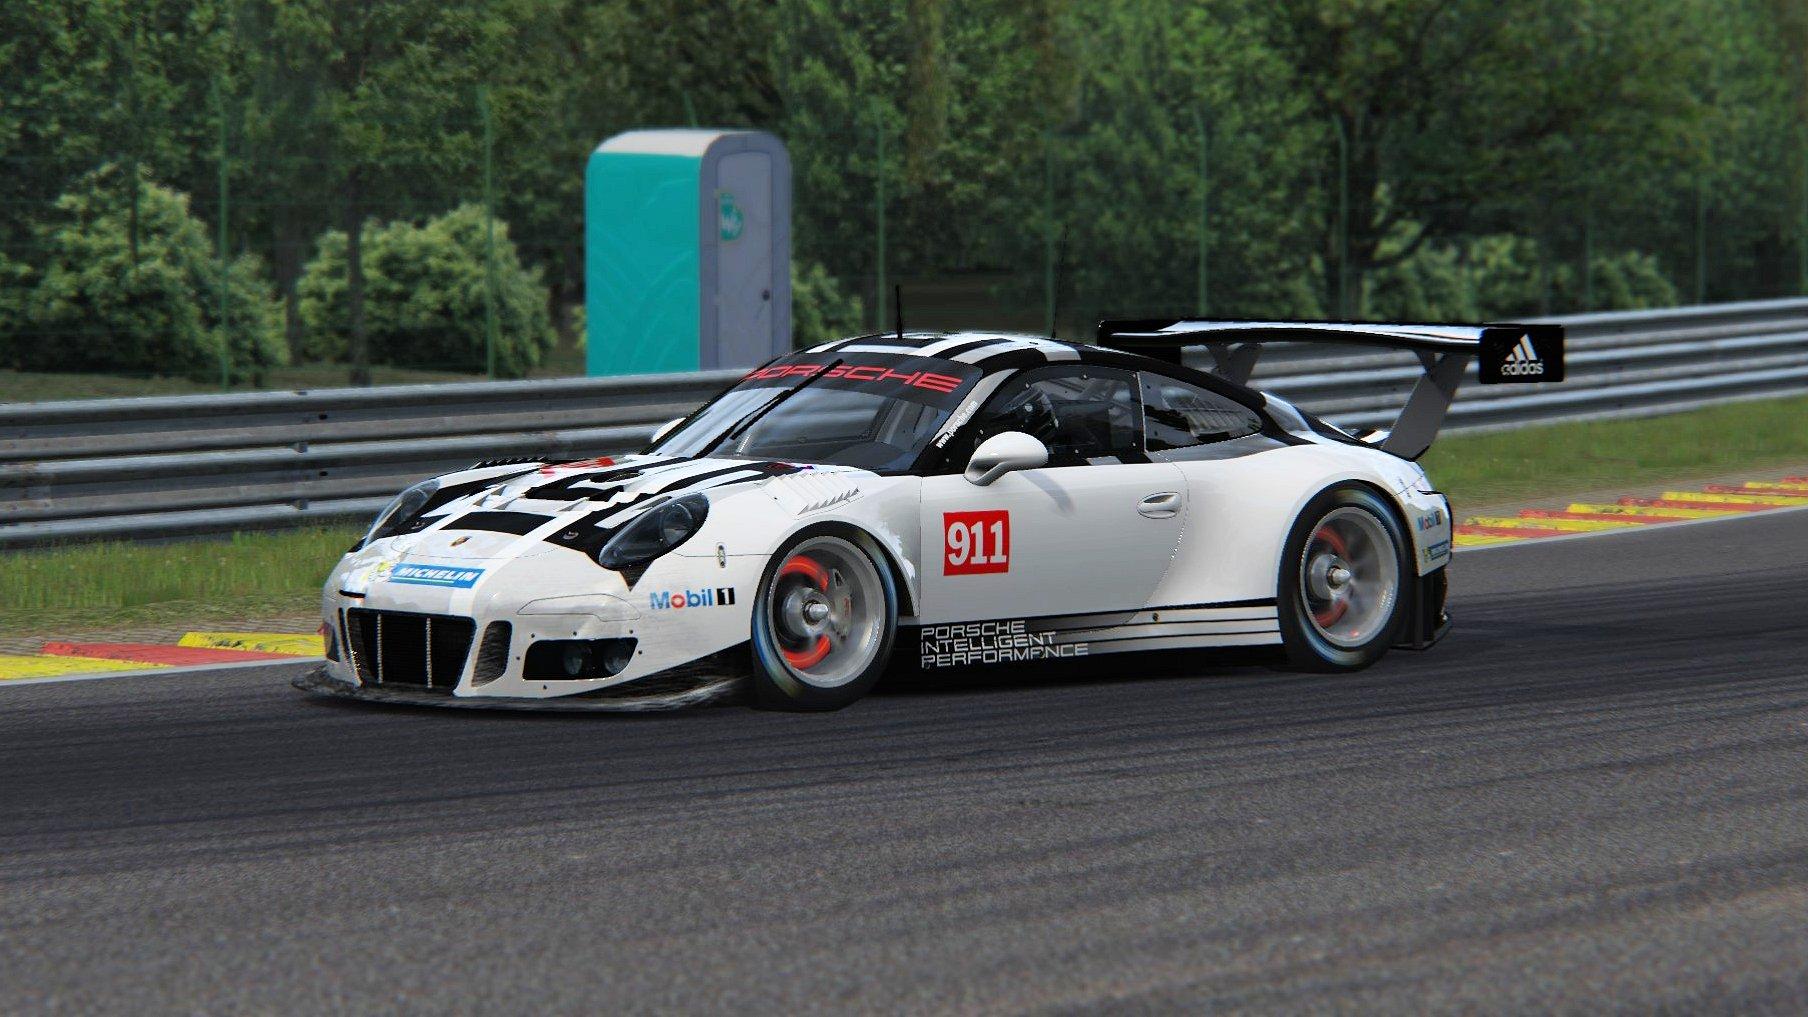 assetto corsa porsche 911 gt3 r 2016 test drive at spa inside sim racing. Black Bedroom Furniture Sets. Home Design Ideas